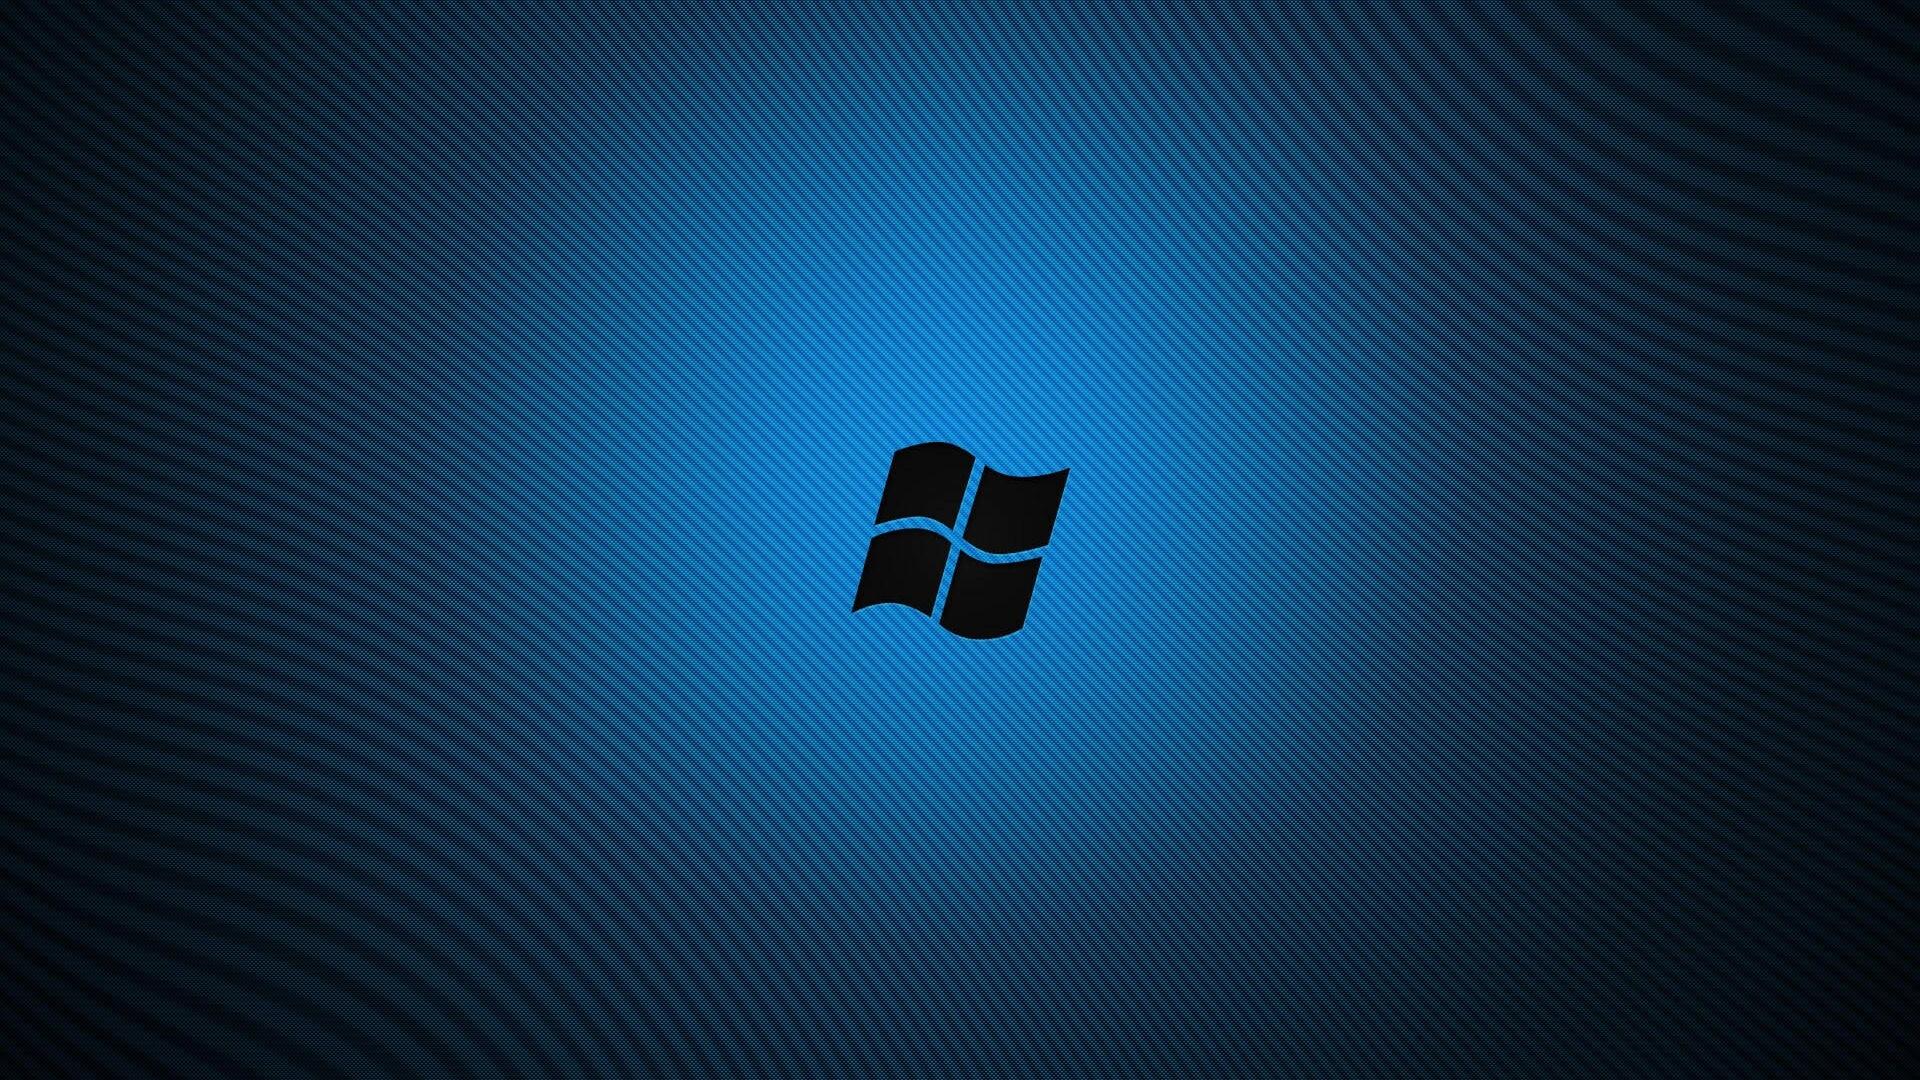 Download Wallpaper 1920x1080 Windows Blue Black Logo Full Hd